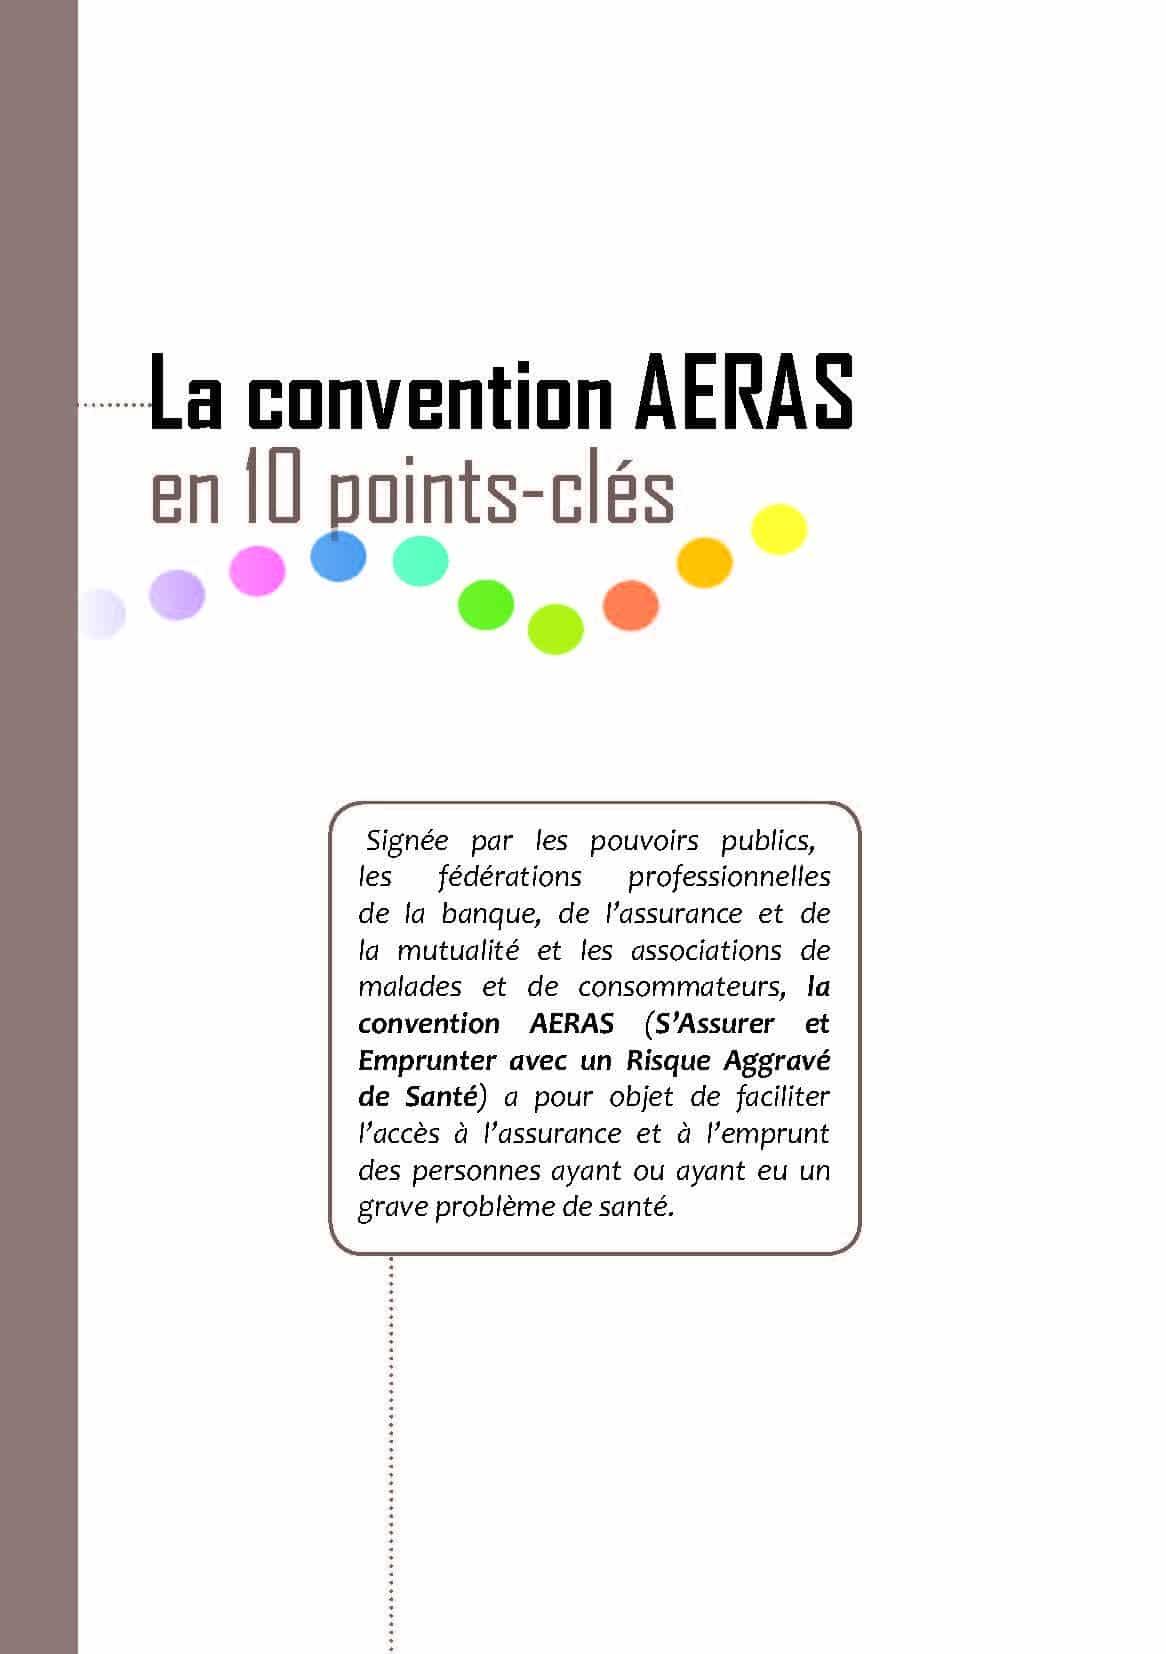 convention AERAS